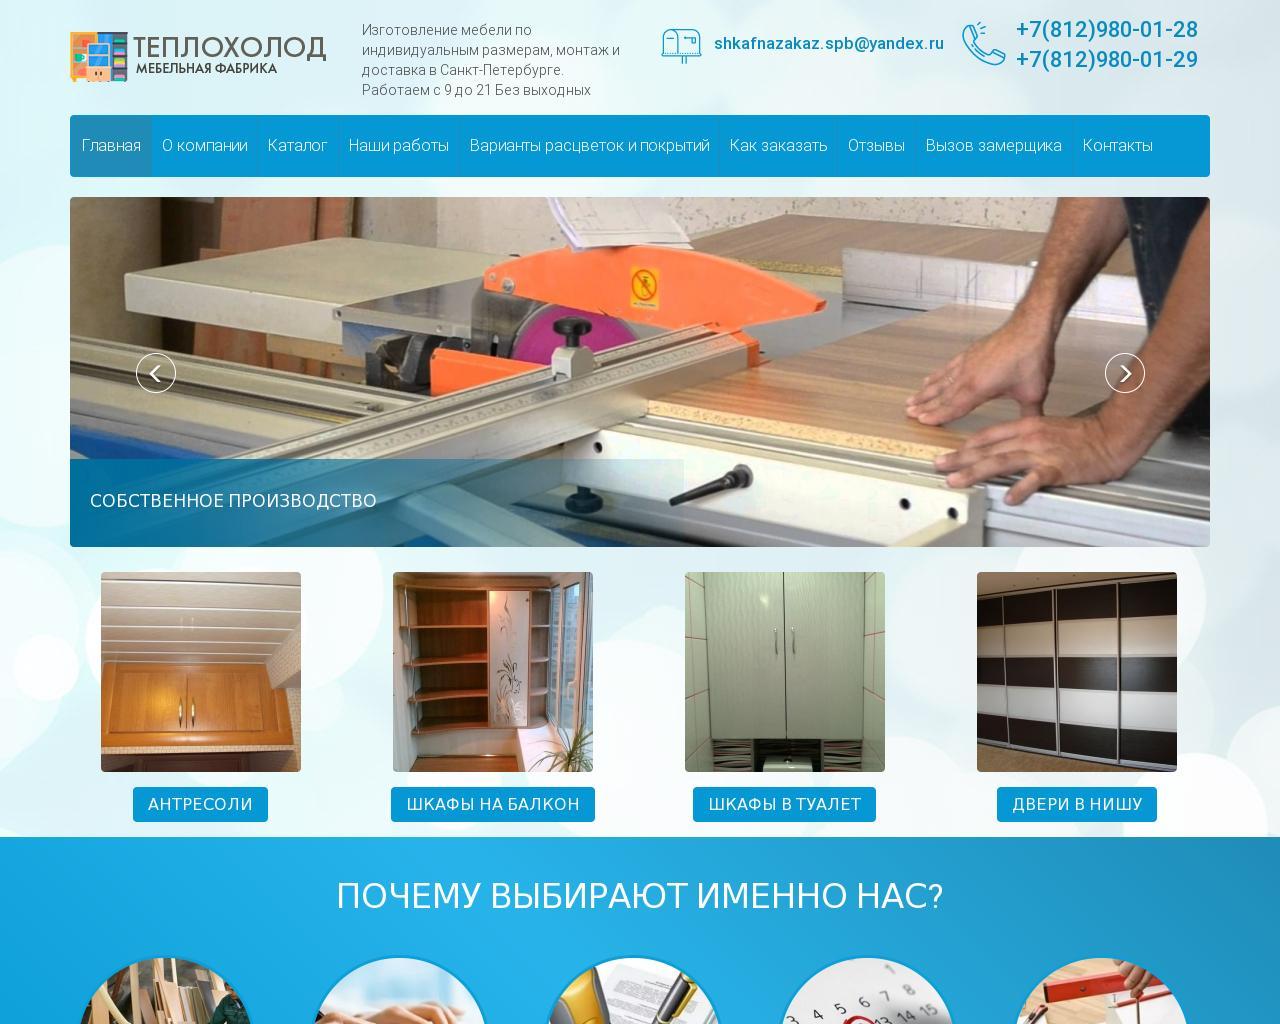 Shkafchik-spb.ru антресоли, шкафы на балкон, туалет, двери в.